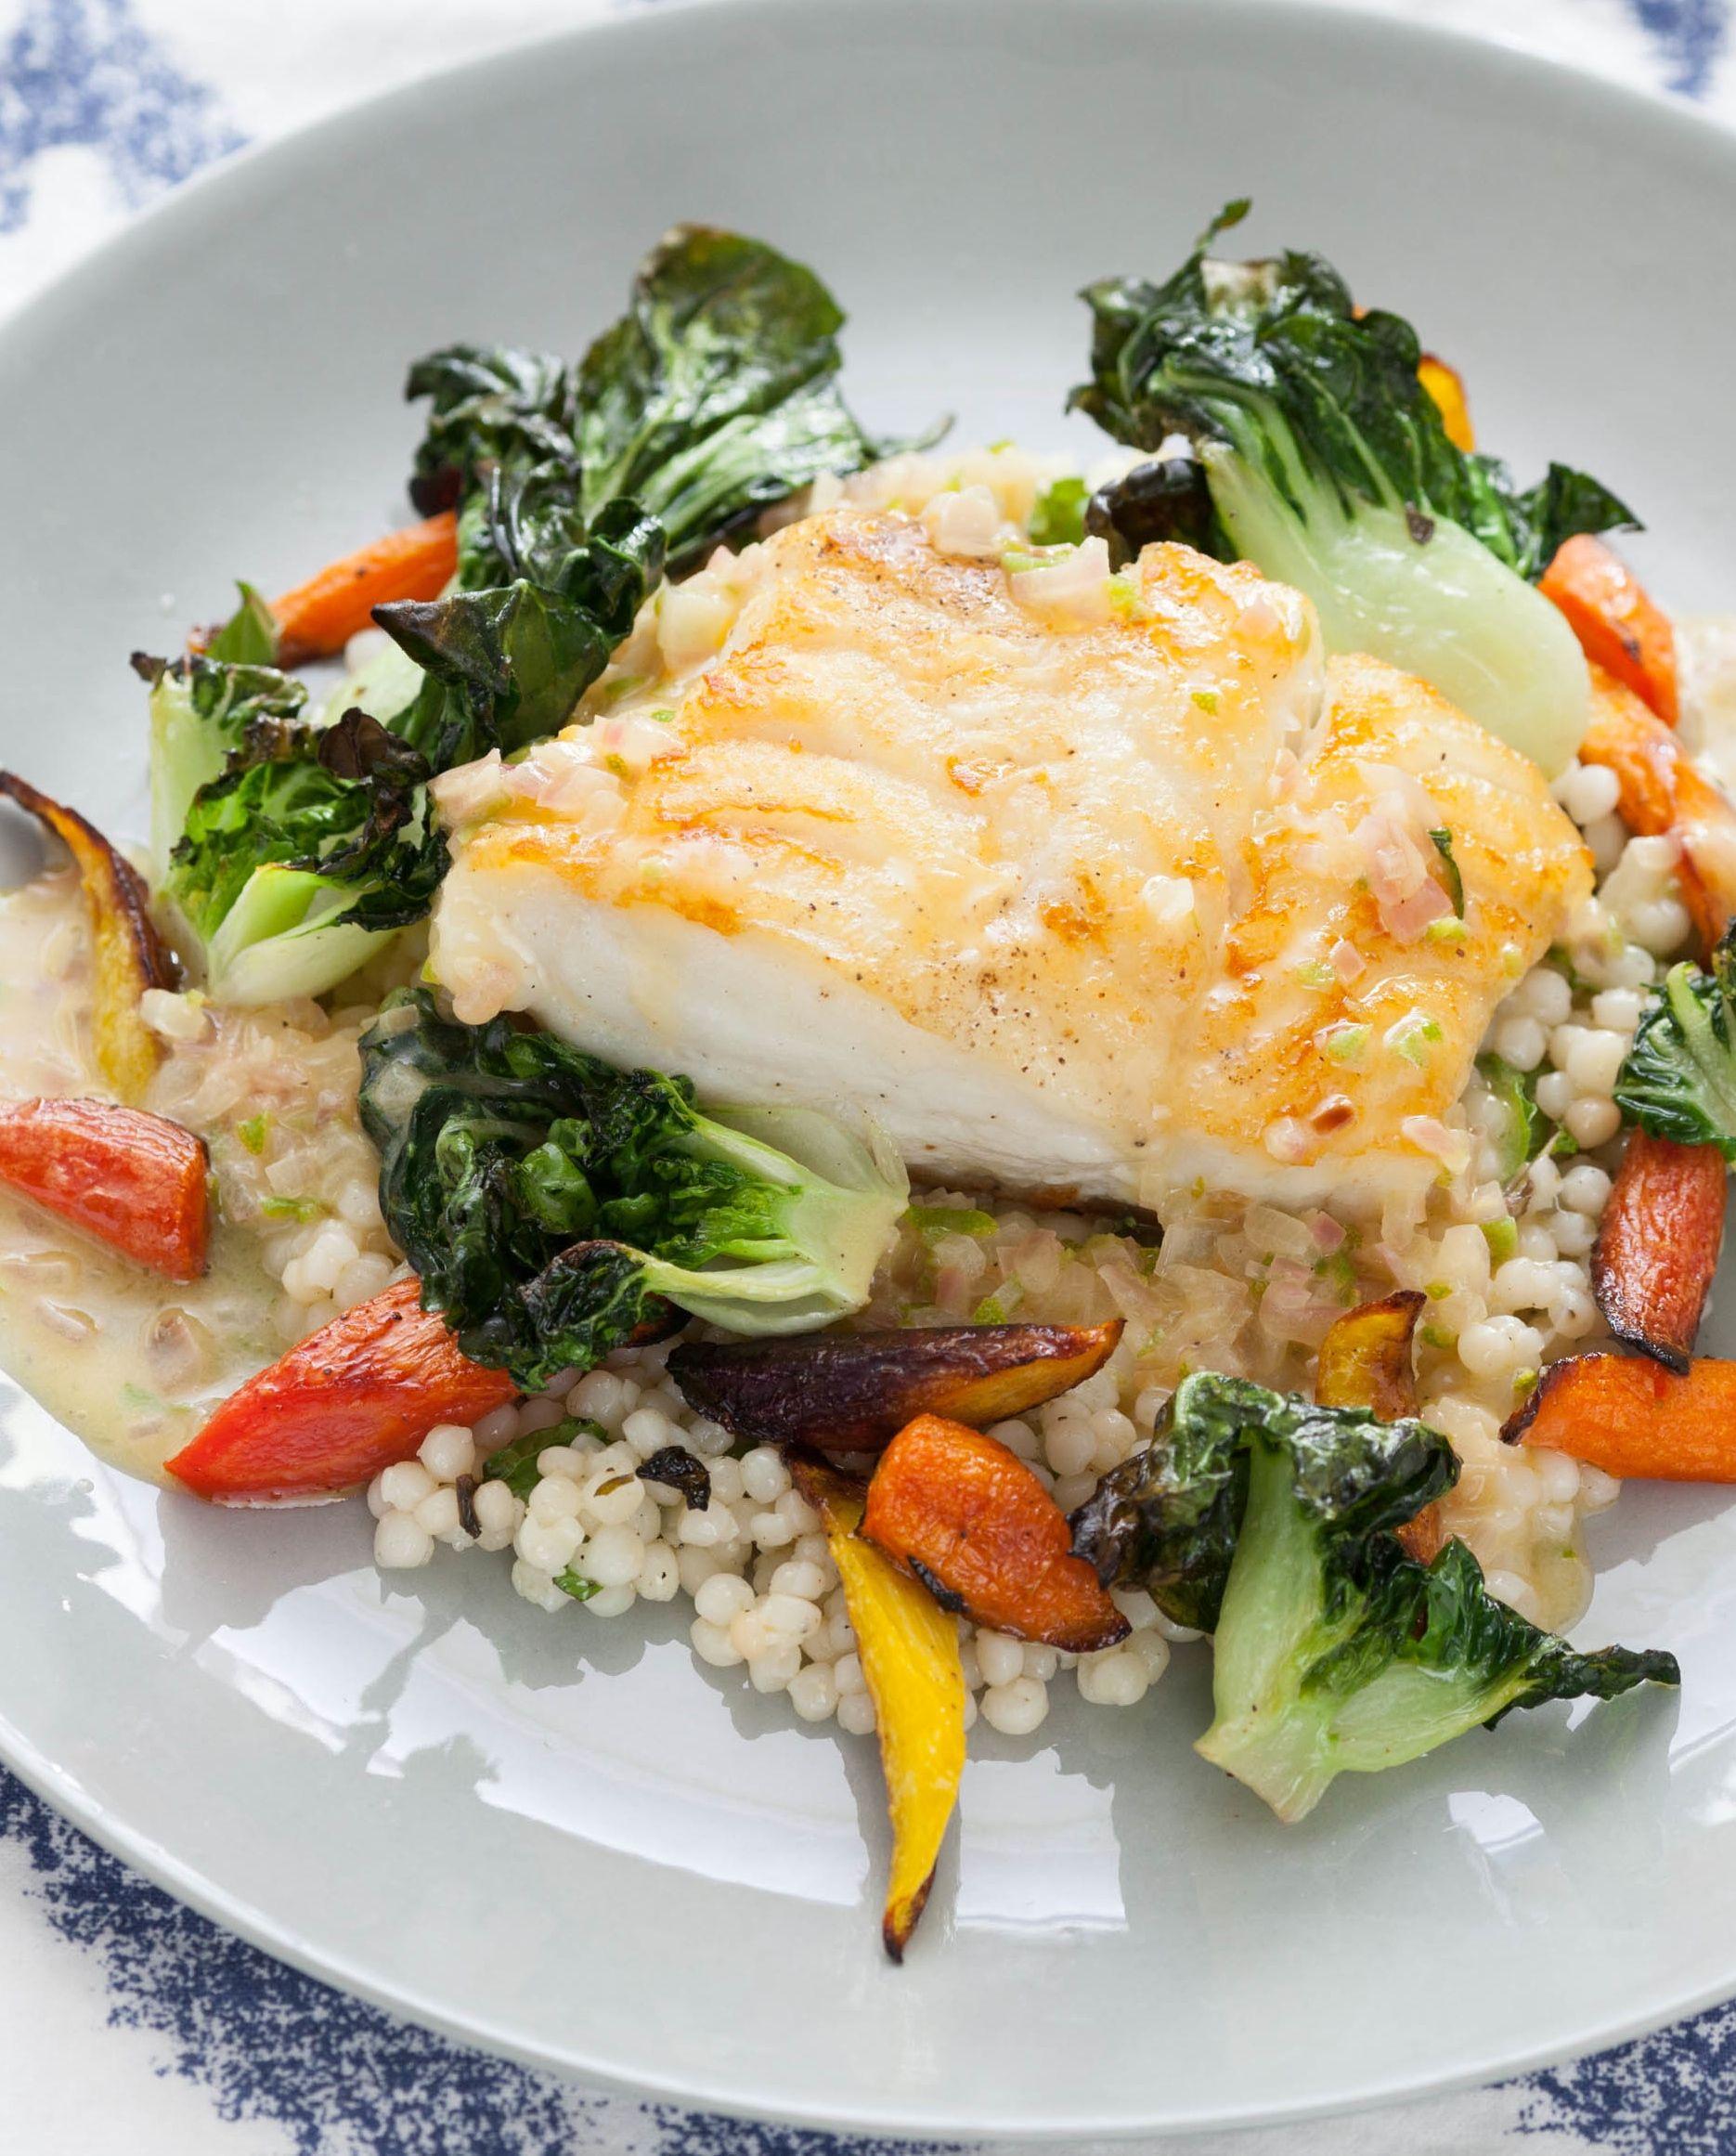 Blue apron tempura cod - Seared Cod With Kaffir Lime Butter Sauce From Blueapron Com